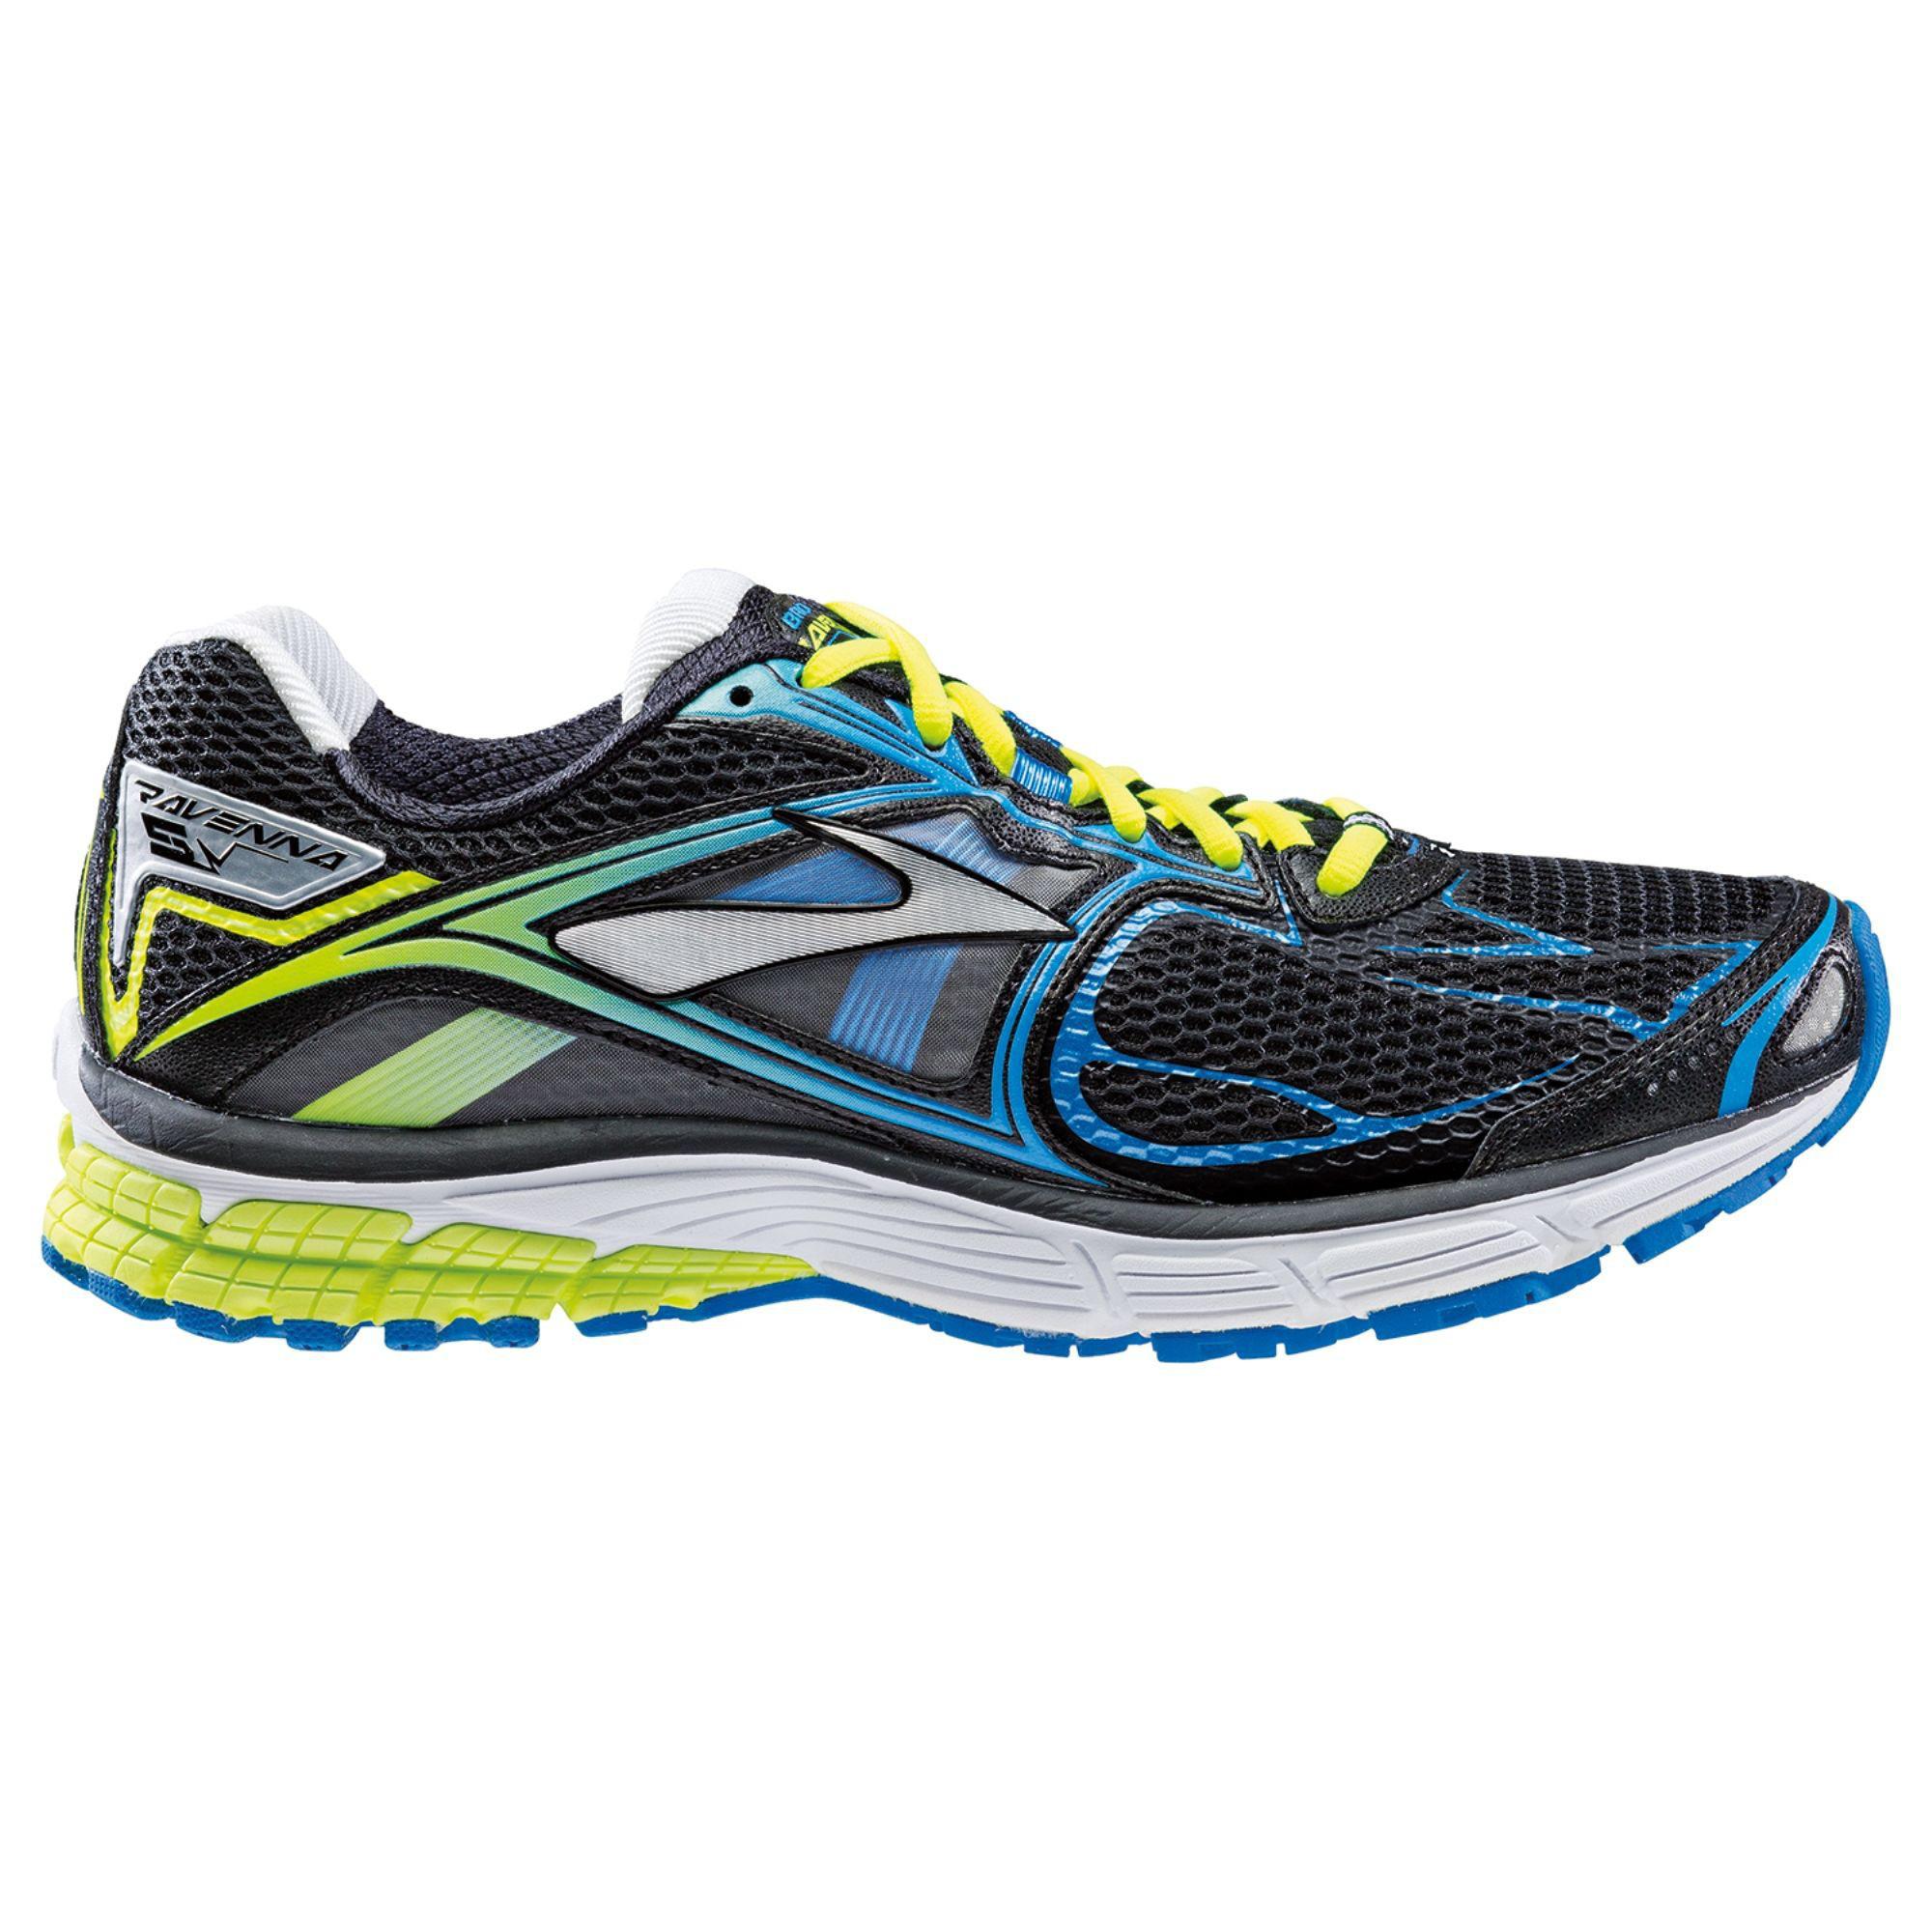 Brooks Ravenna 5 - Shoe Reviews